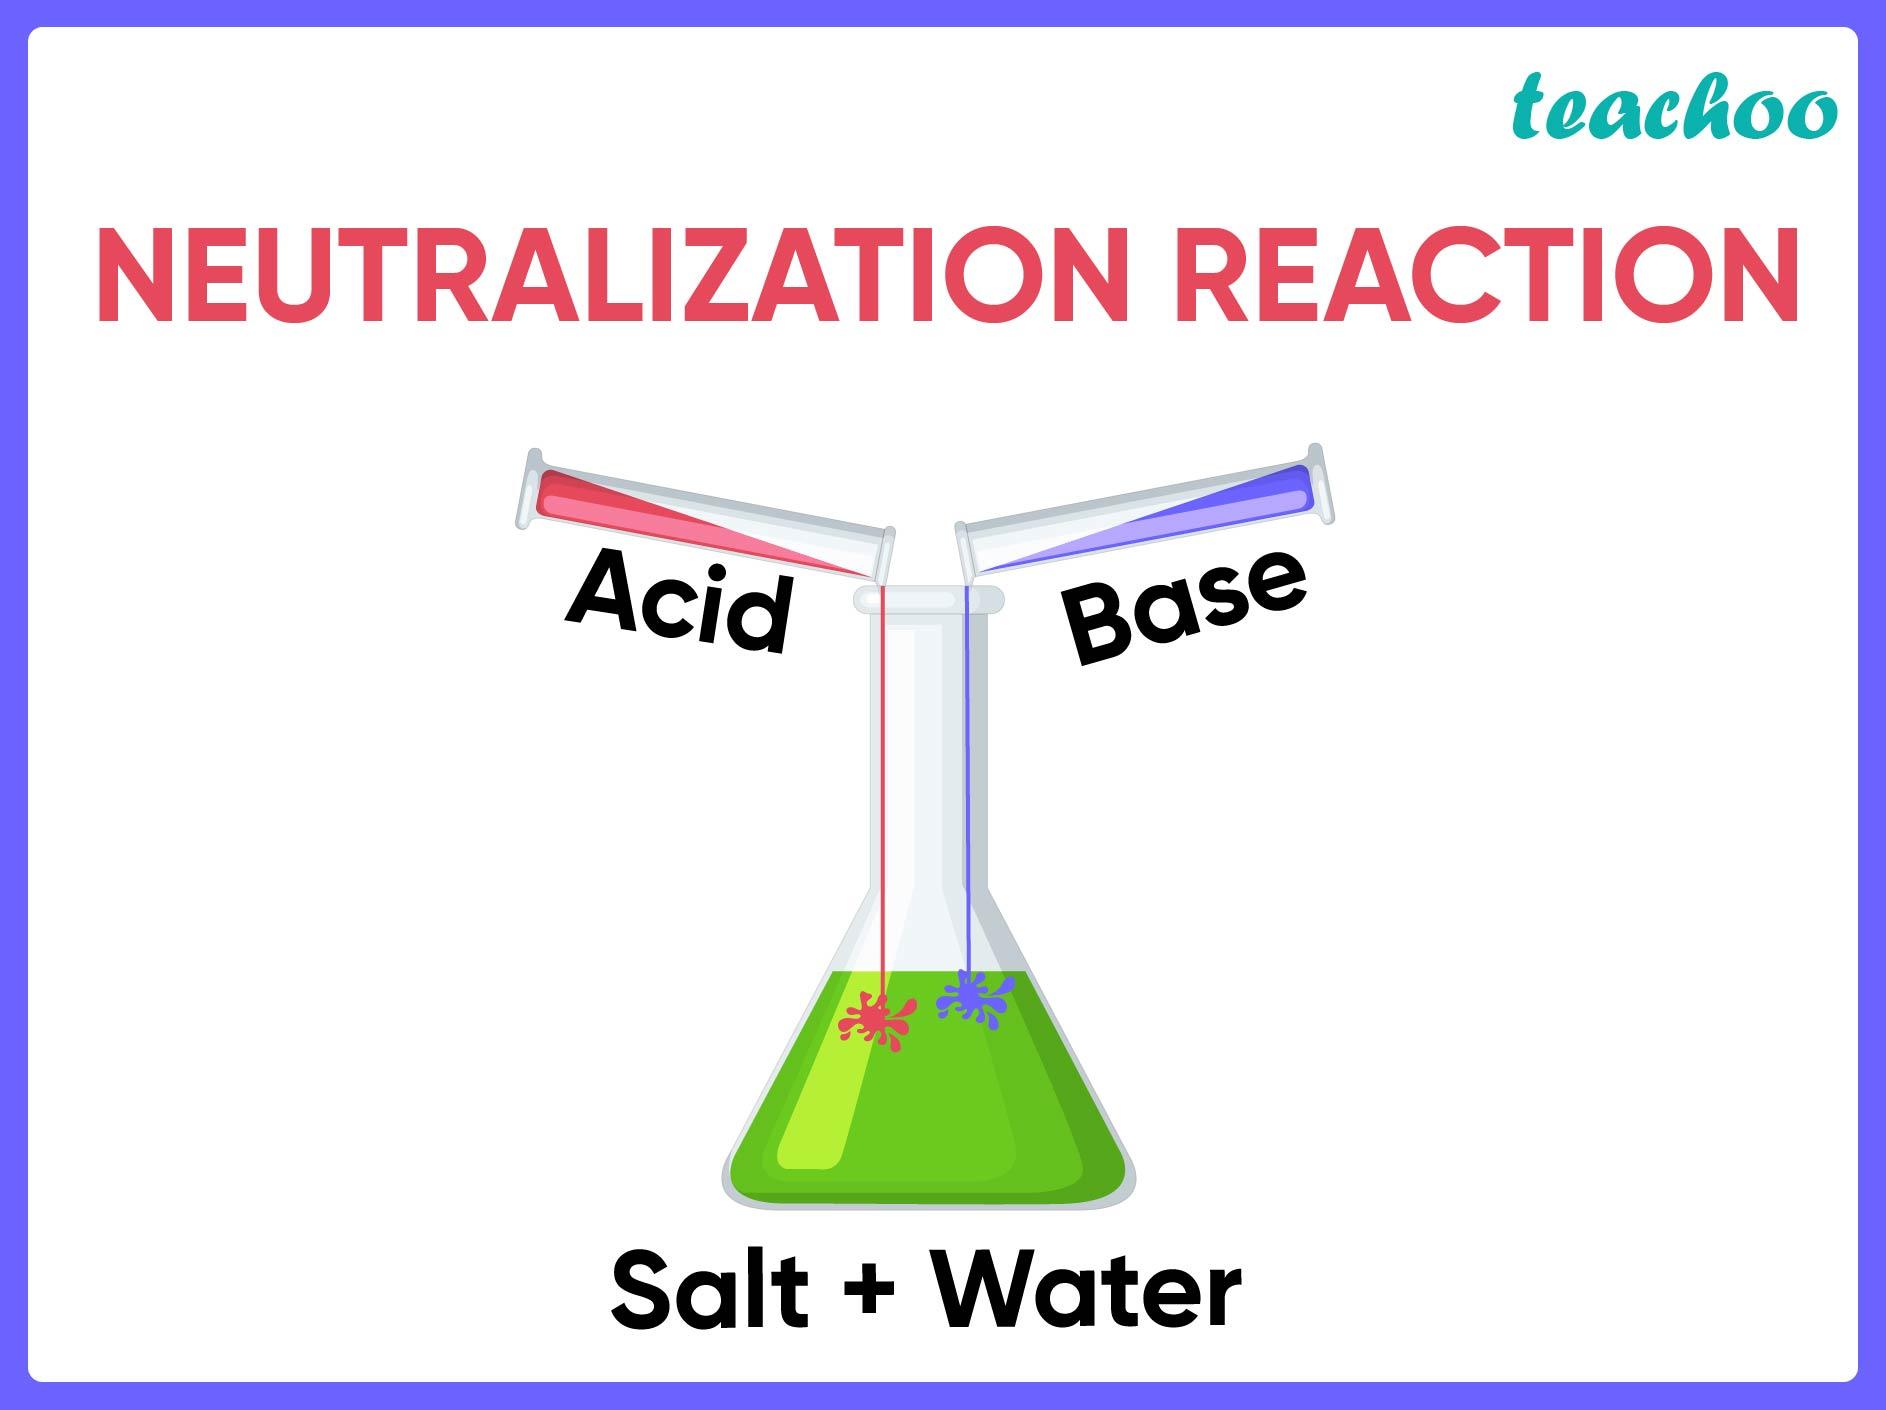 Neutralization reaction.jpg